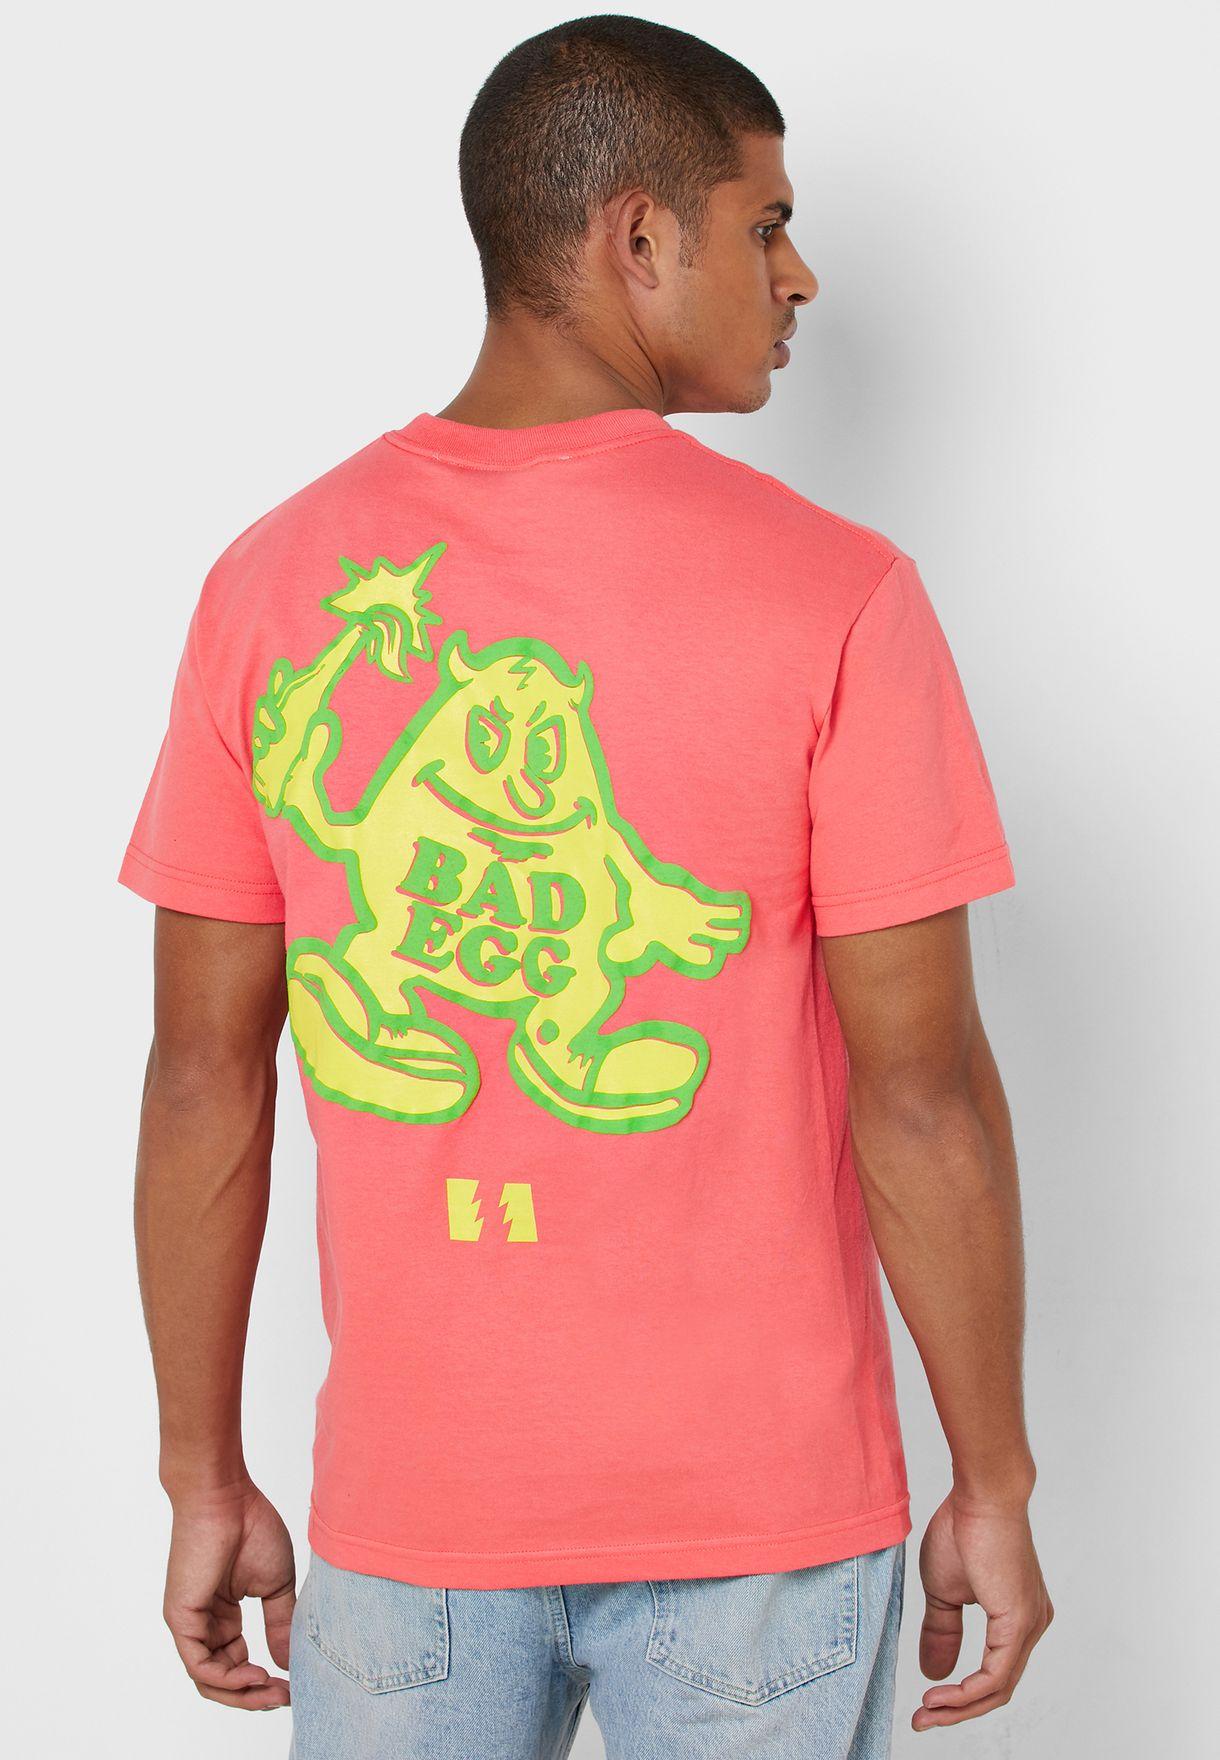 Deviled T-Shirt